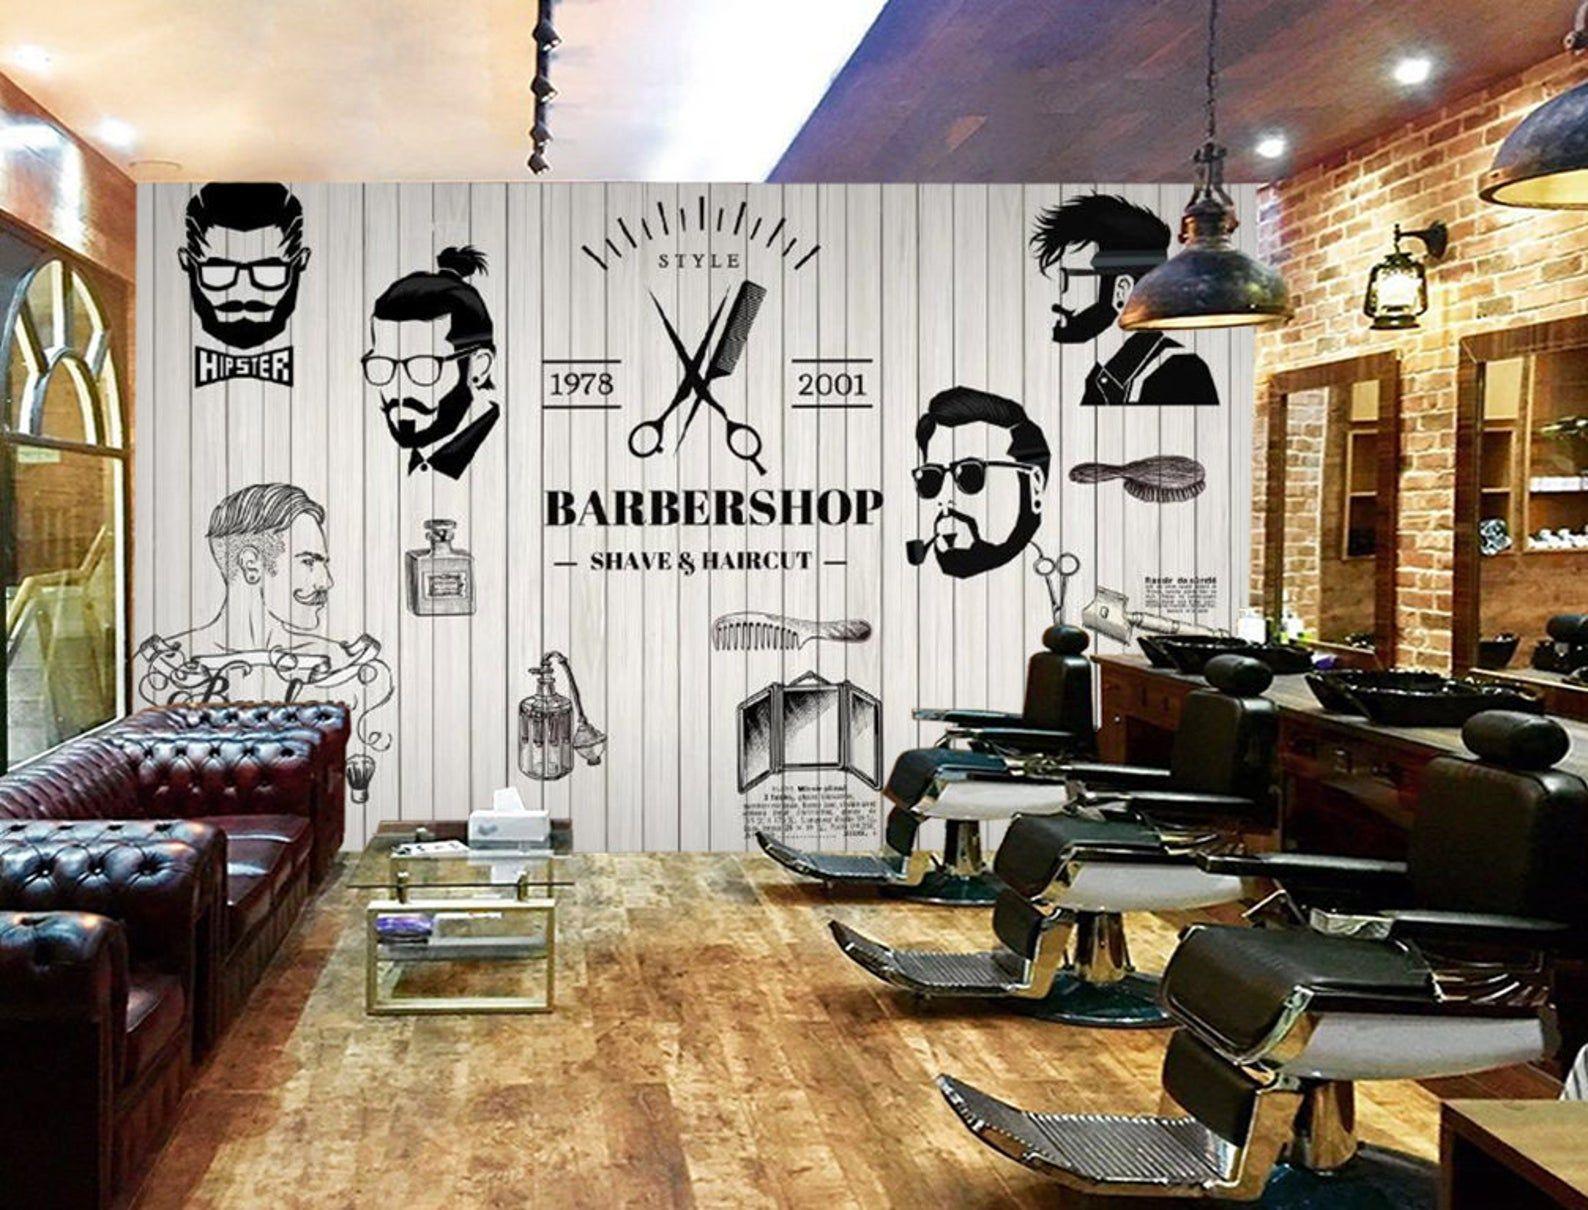 3d Barber Shop Wgn111 Wallpaper Mural Decal Mural Photo Etsy Barber Shop Interior Barber Shop Decor Barber Shop